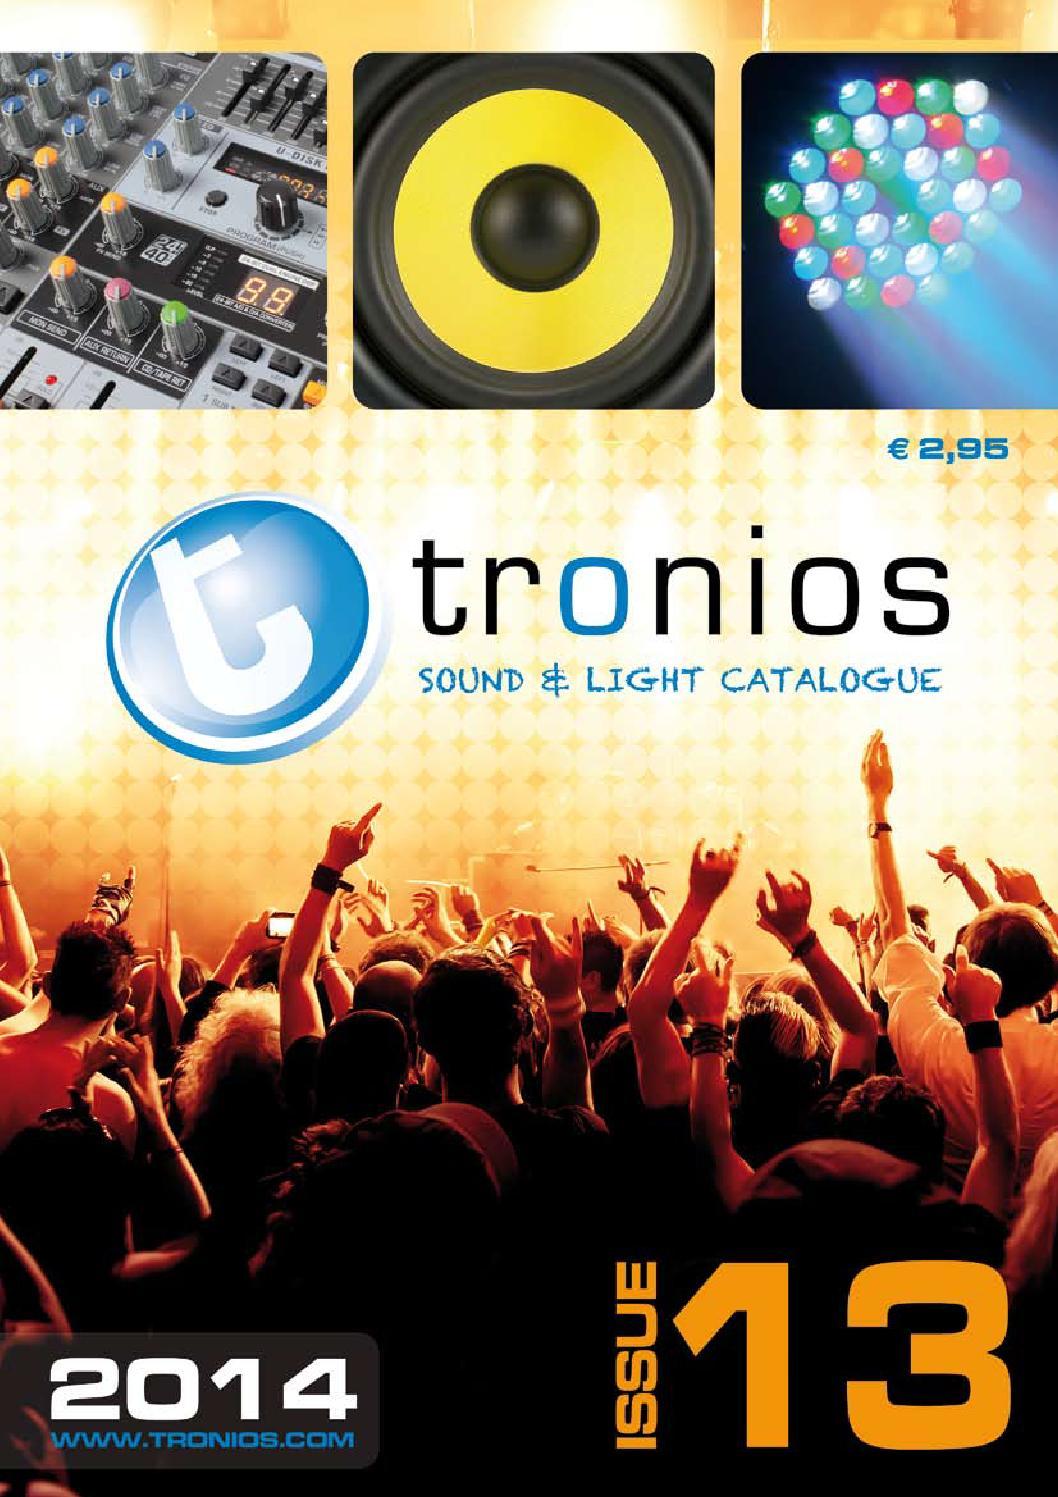 Sound Light Catalogue 2014 English By Tronios Bv Issuu Stk Audio Ic 60w